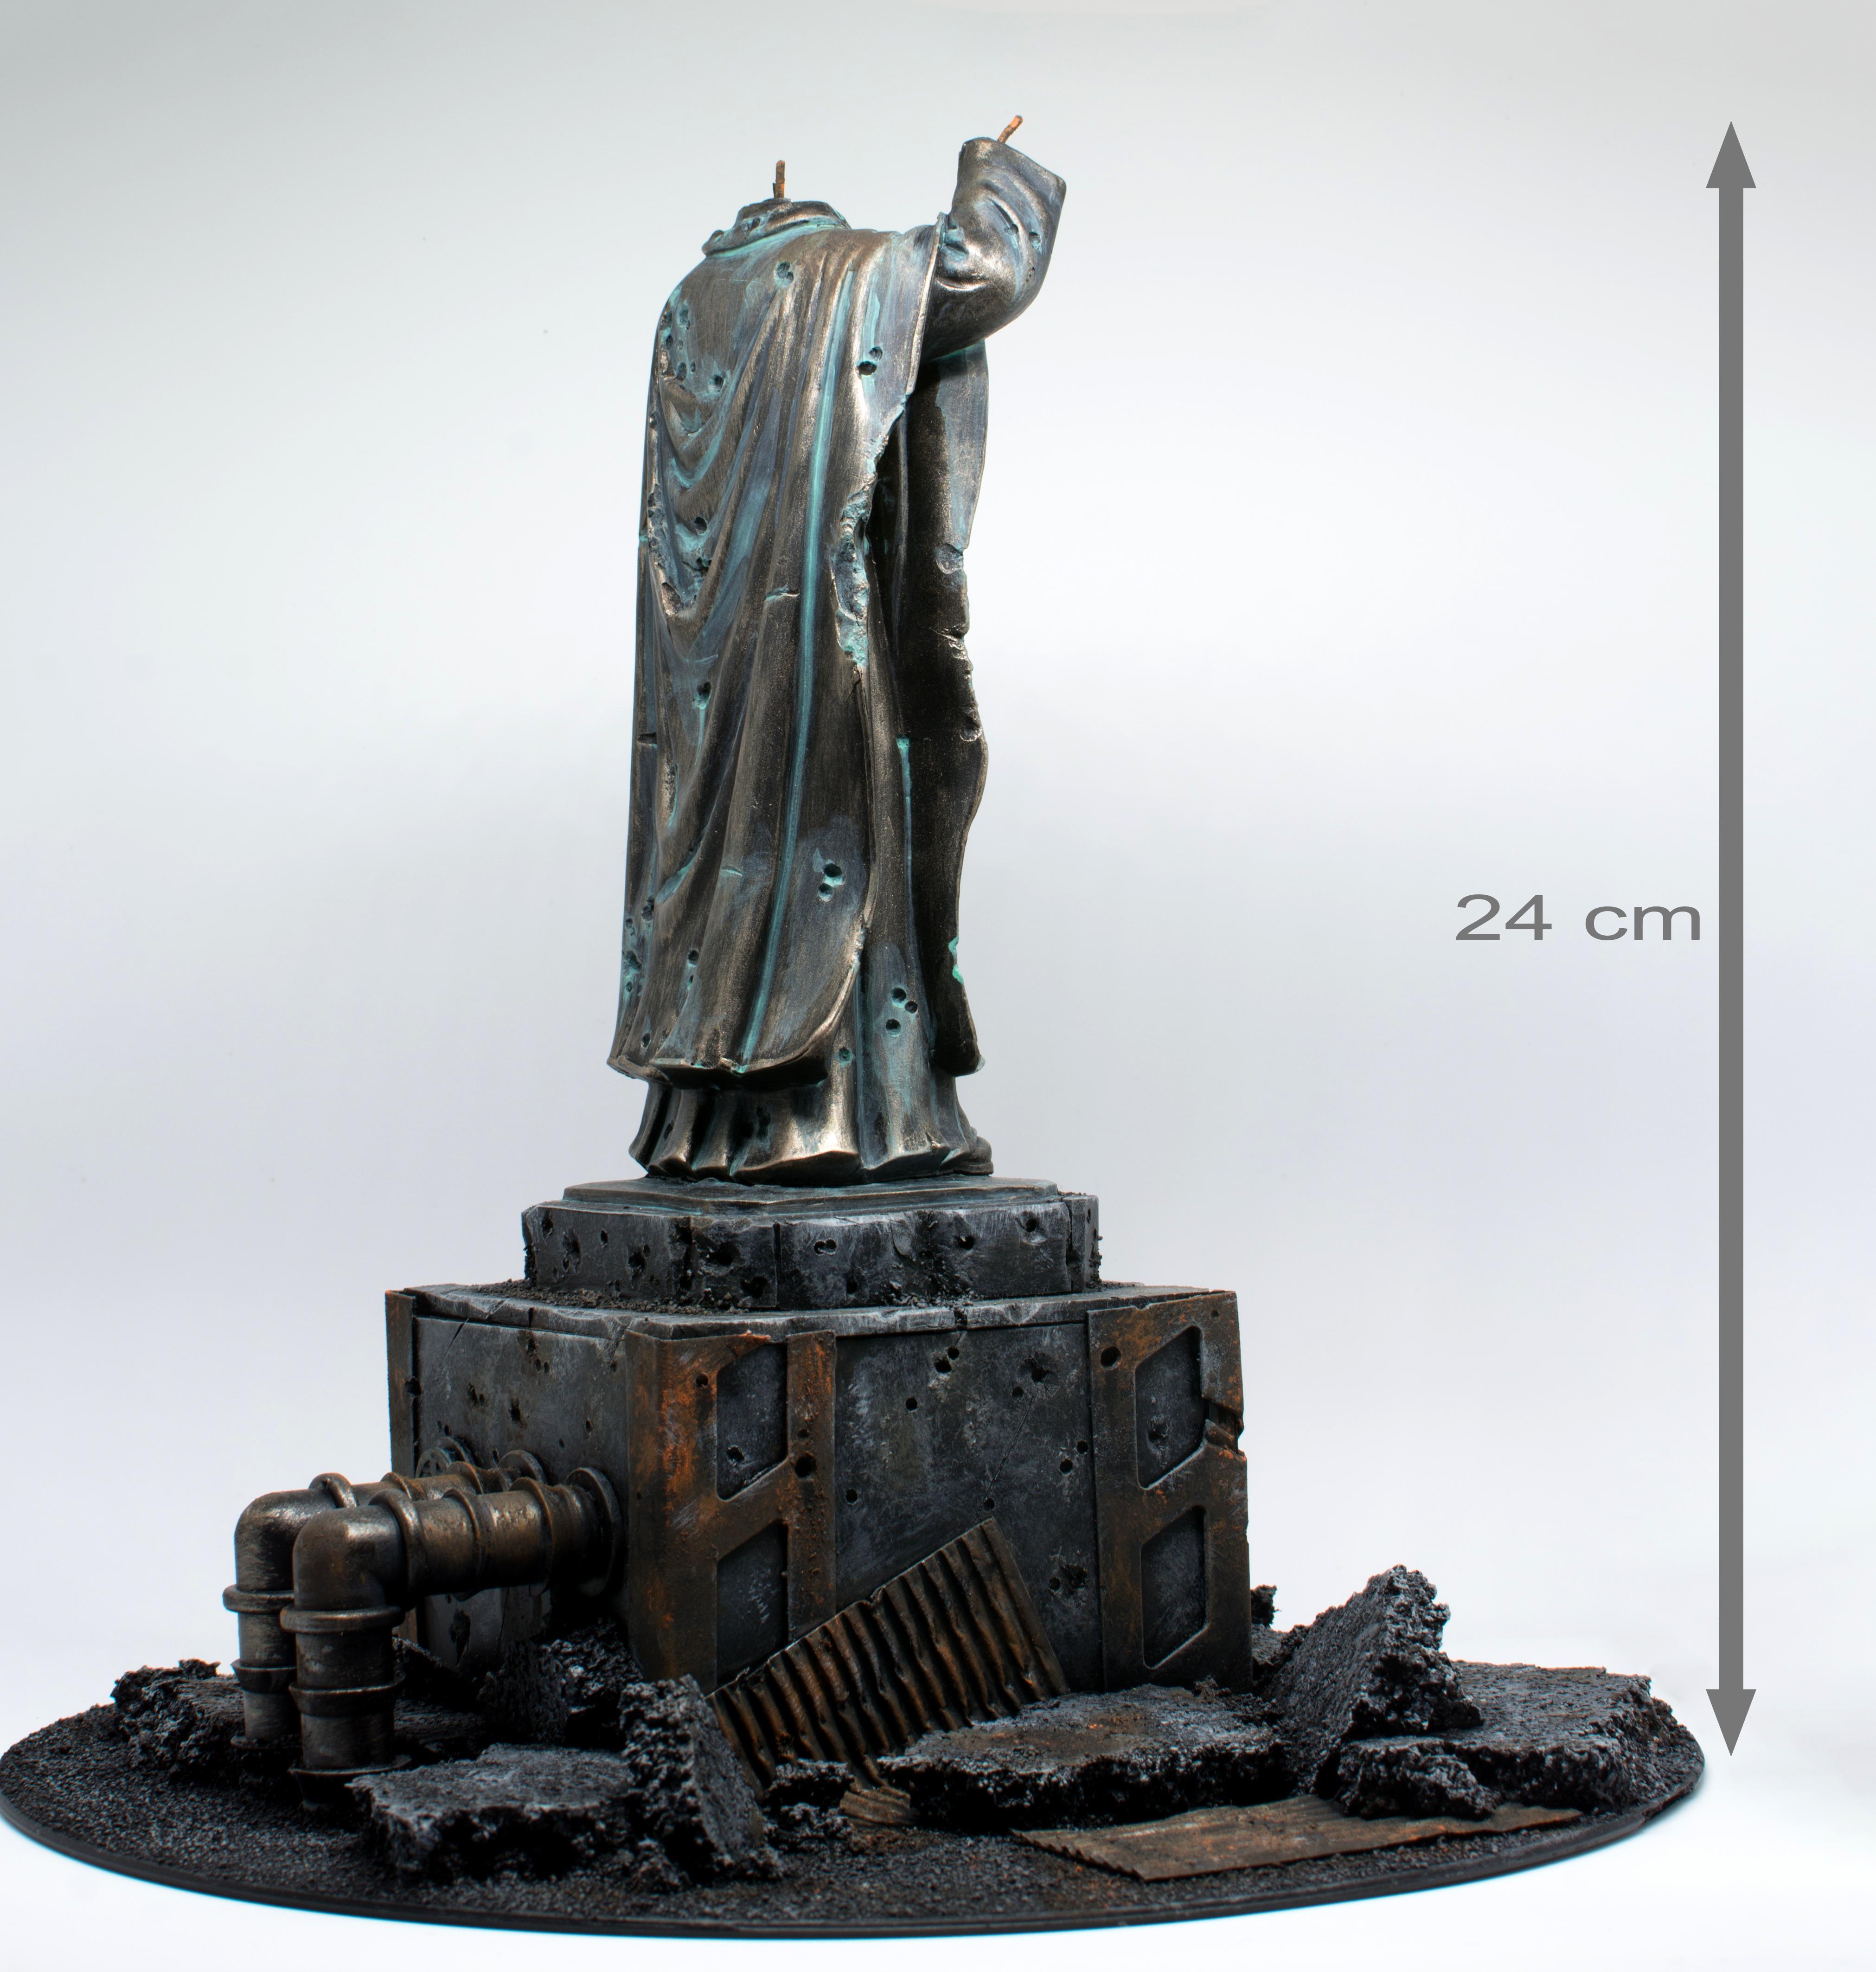 Copper, Craft, Décor, Imperialis Sector, Imperium, Monument, Necromunda, Rubble, Ruins, Rust, Set, Statue, Terrain, Warhammer 40,000